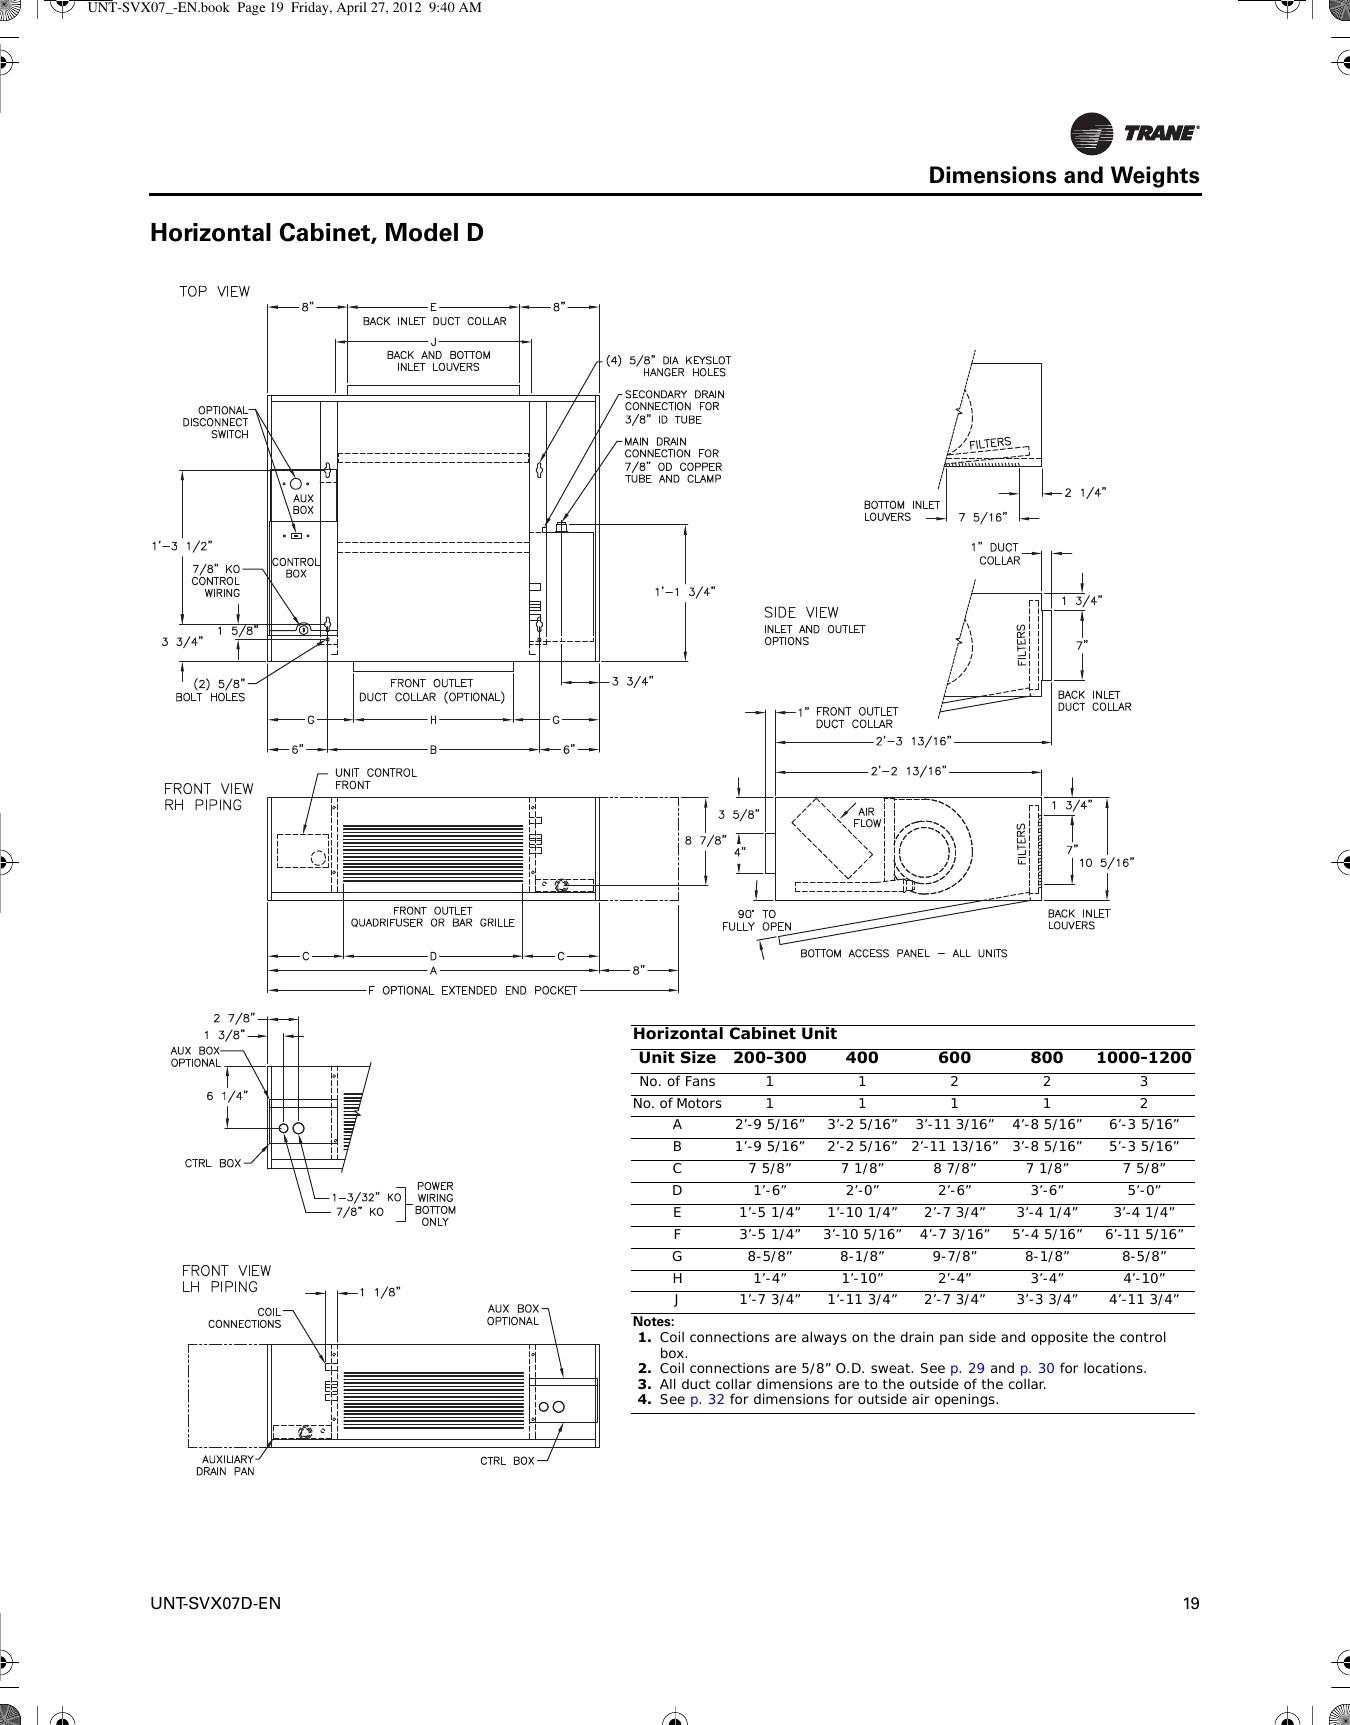 hight resolution of hid rp40 wiring diagram trane wsc060 wiring diagram download trane wiring diagrams fresh trane heat